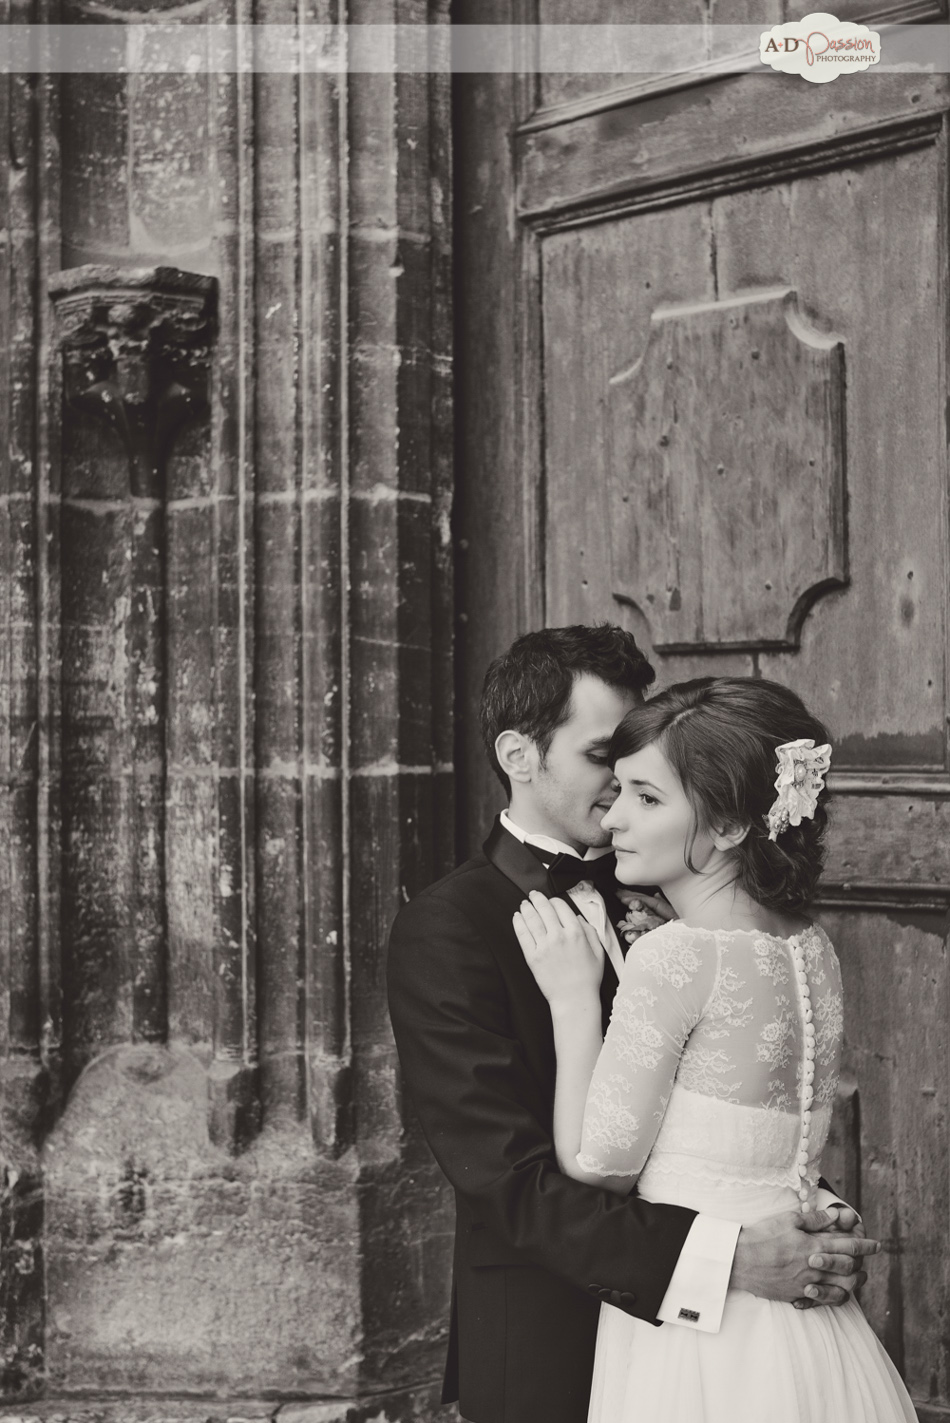 AD Passion Photography | 20130529_fotograf-nunta_elisa_si_marius_0083 | Adelin, Dida, fotograf profesionist, fotograf de nunta, fotografie de nunta, fotograf Timisoara, fotograf Craiova, fotograf Bucuresti, fotograf Arad, nunta Timisoara, nunta Arad, nunta Bucuresti, nunta Craiova